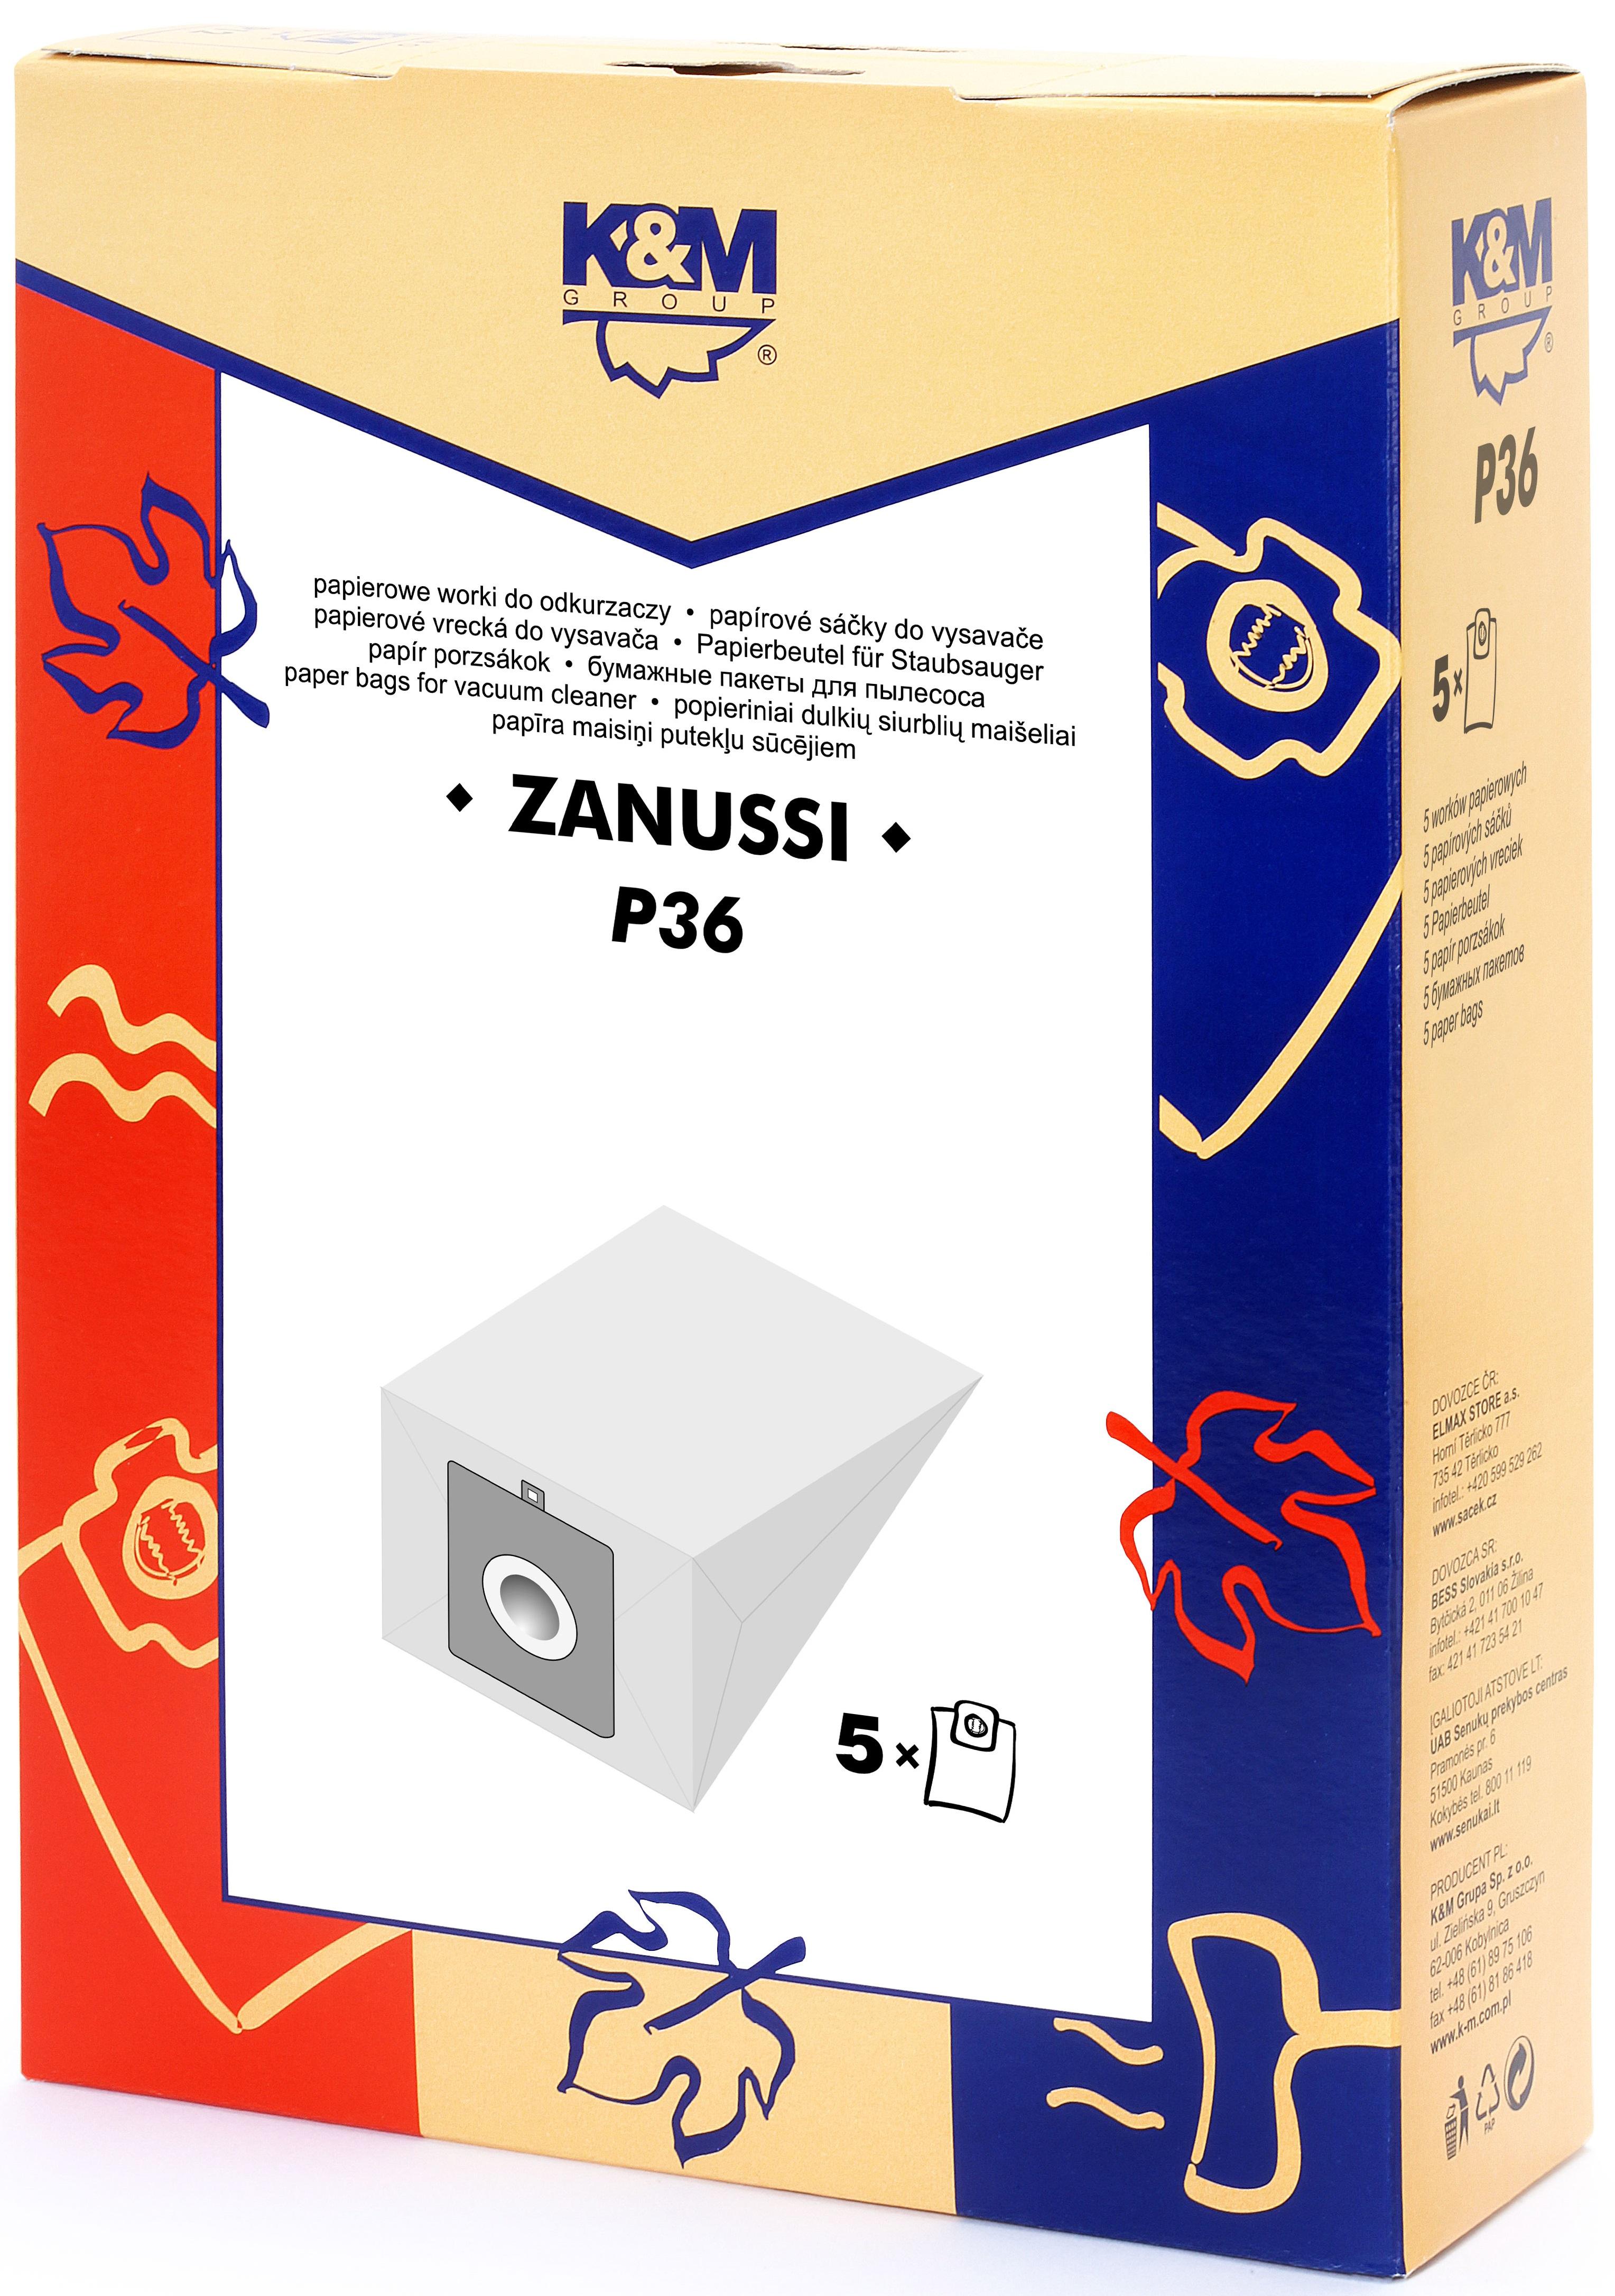 Sac aspirator Zanussi 3321, 3341, hartie, 5X saci, K&M 0